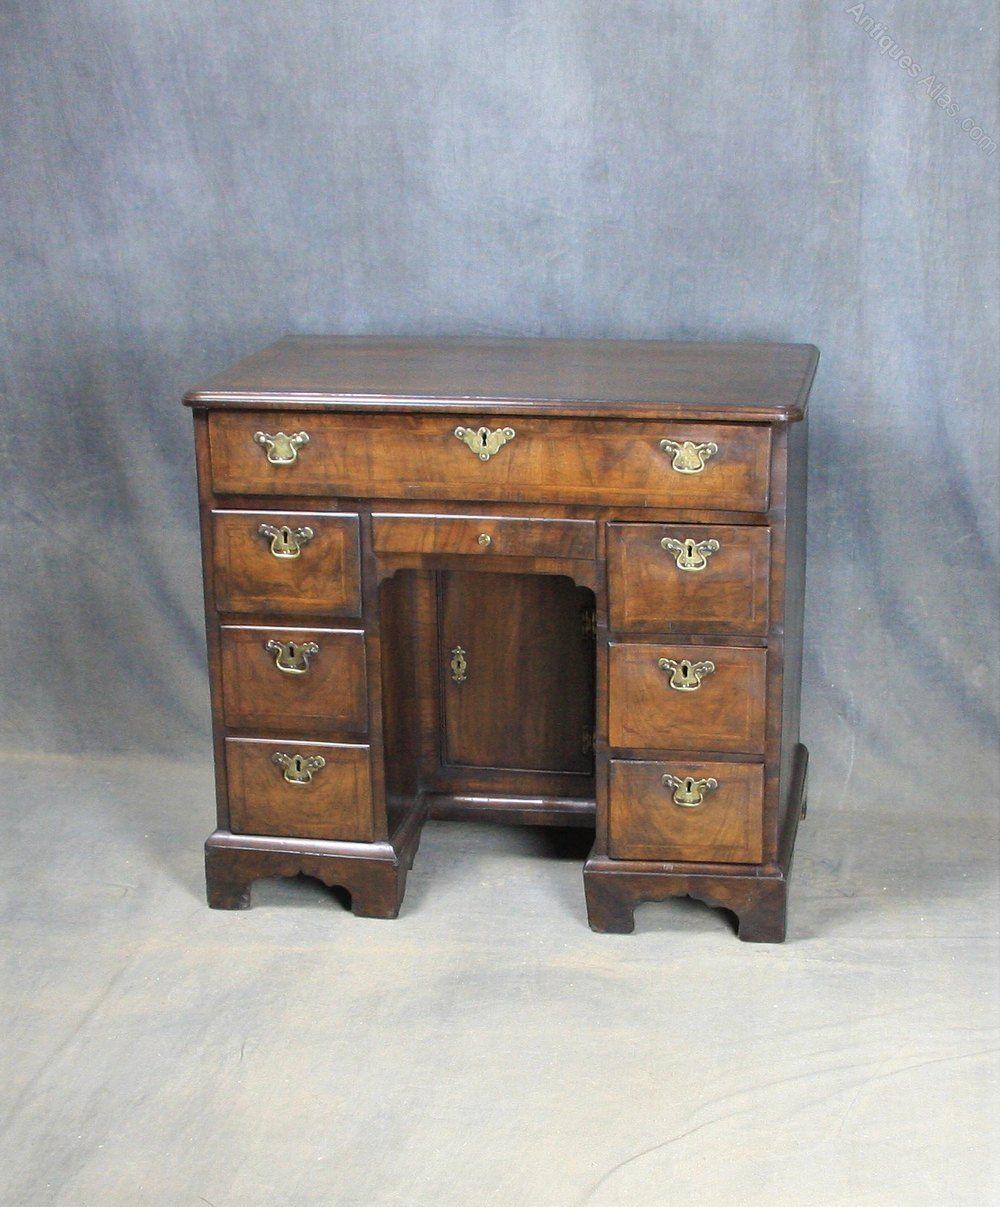 George I Walnut Kneehole Desk Desk Small Cupboard Antique Desk